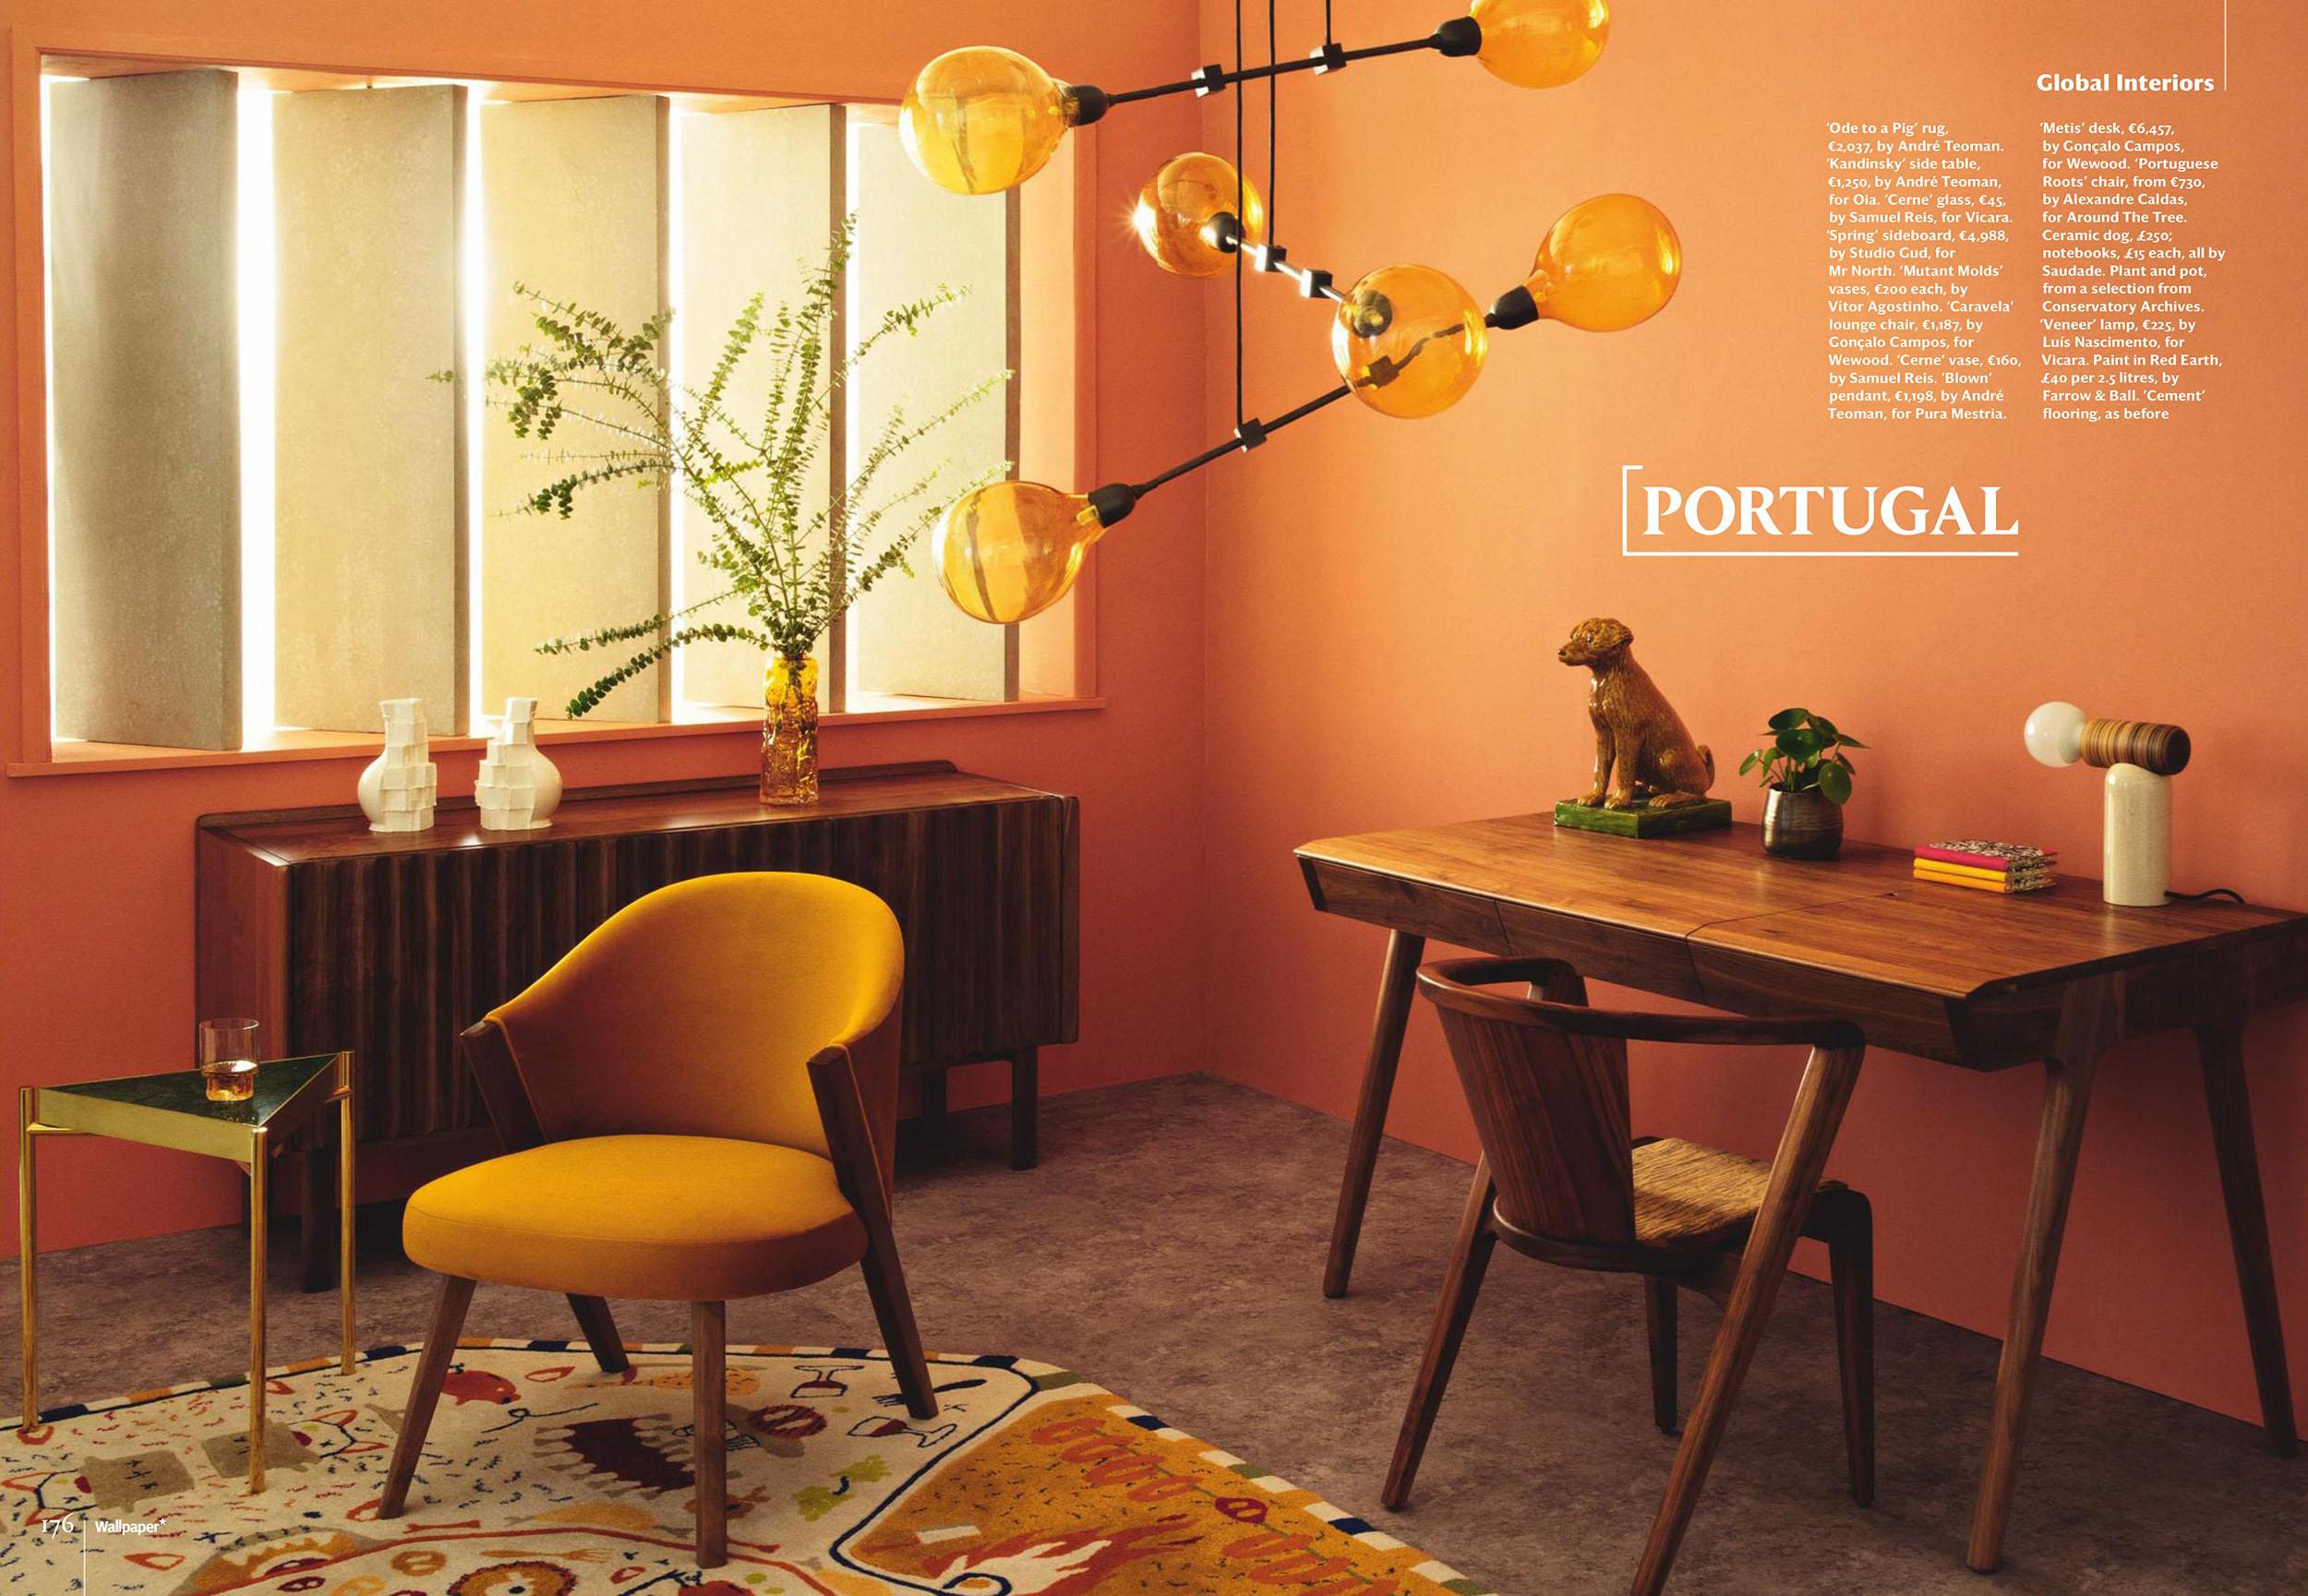 Wallpaper - Portugal